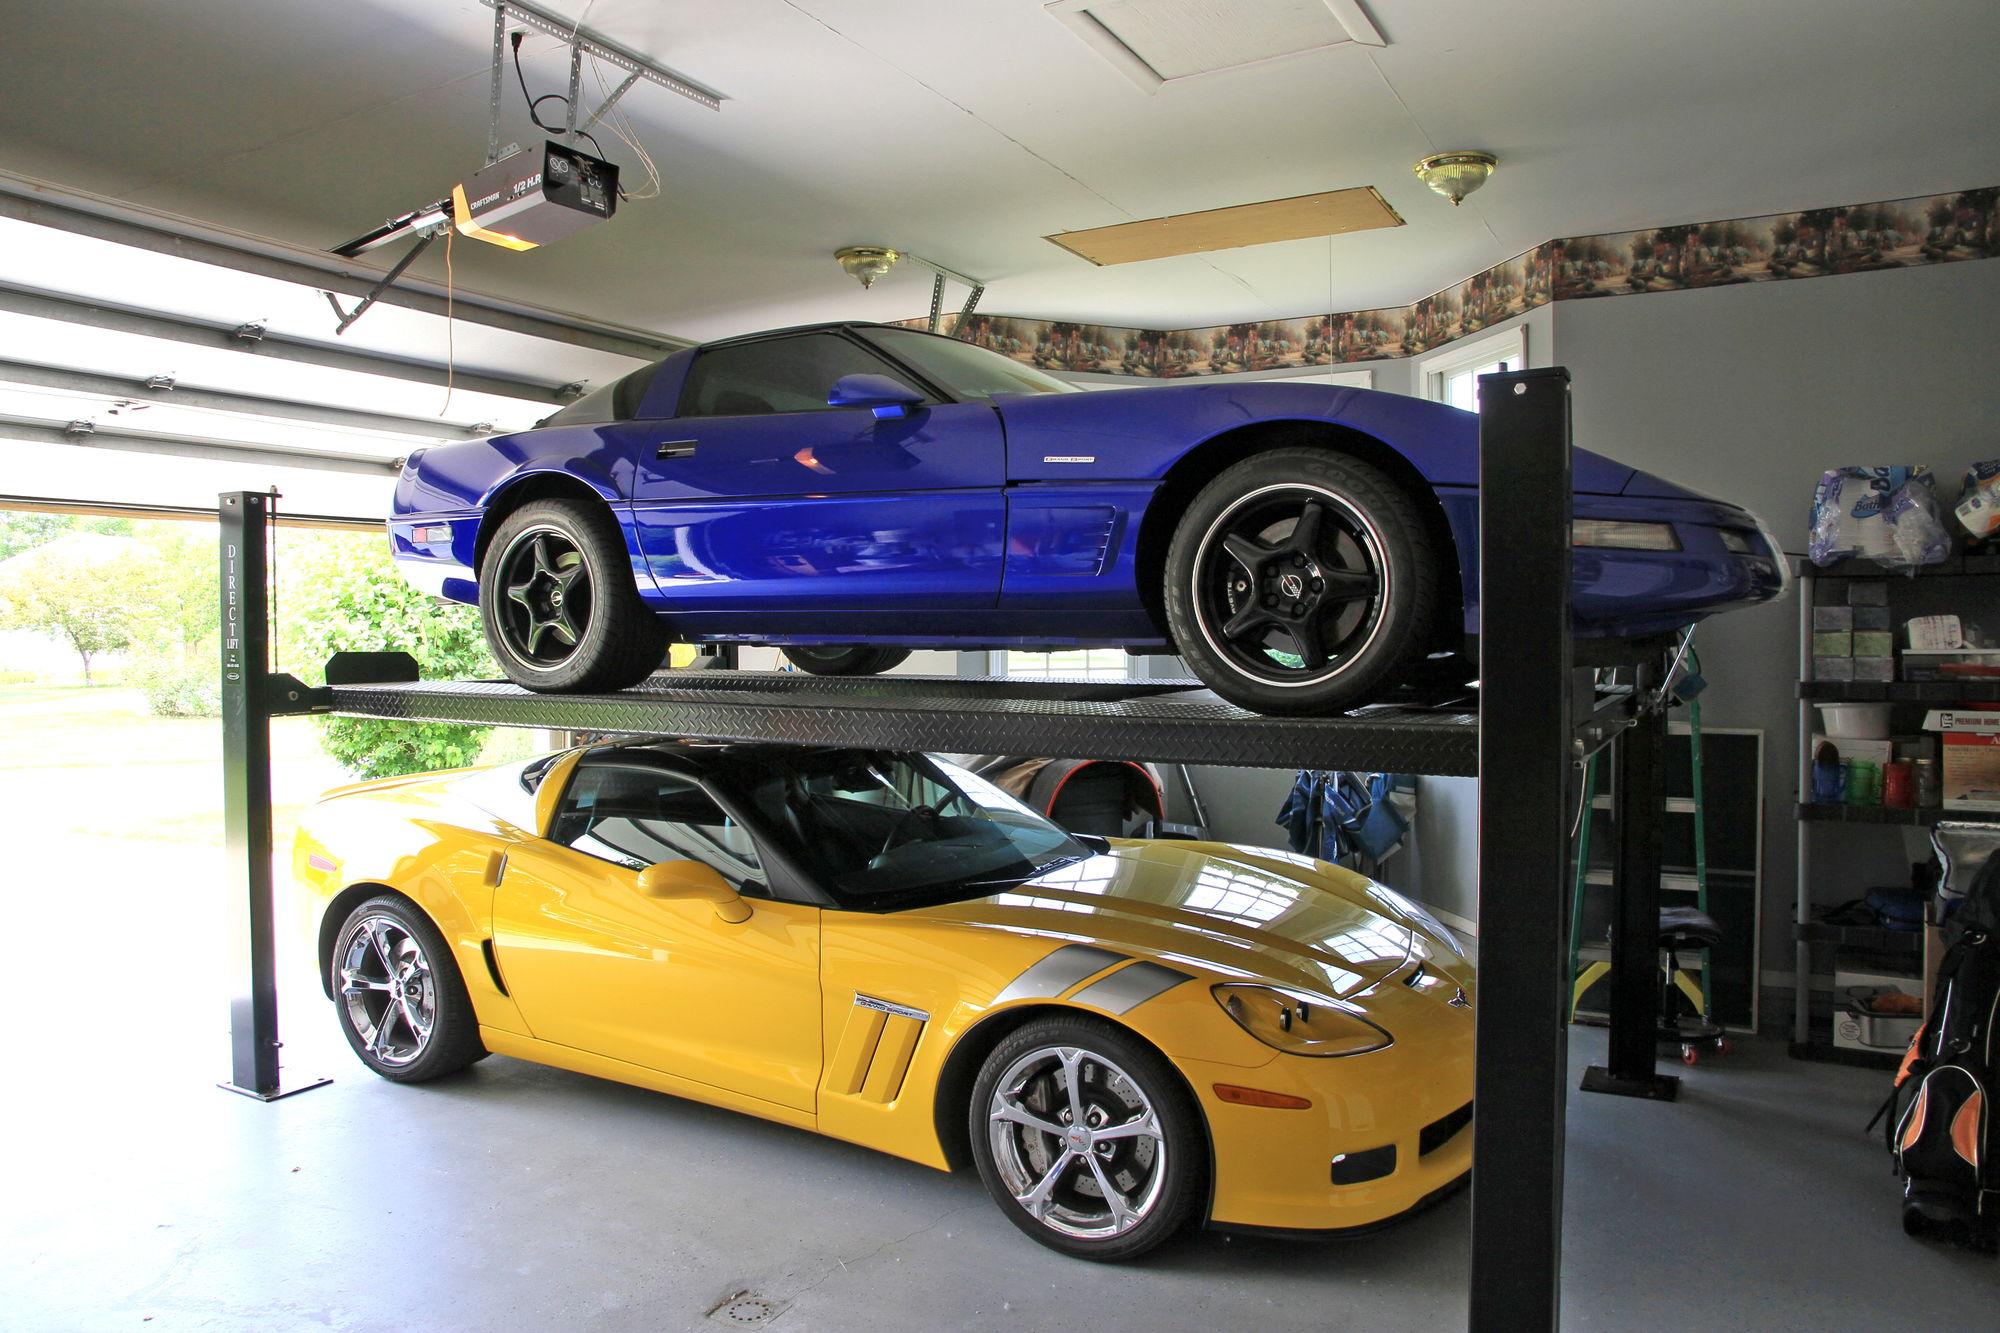 4 post lift for garage page 2 corvetteforum chevrolet